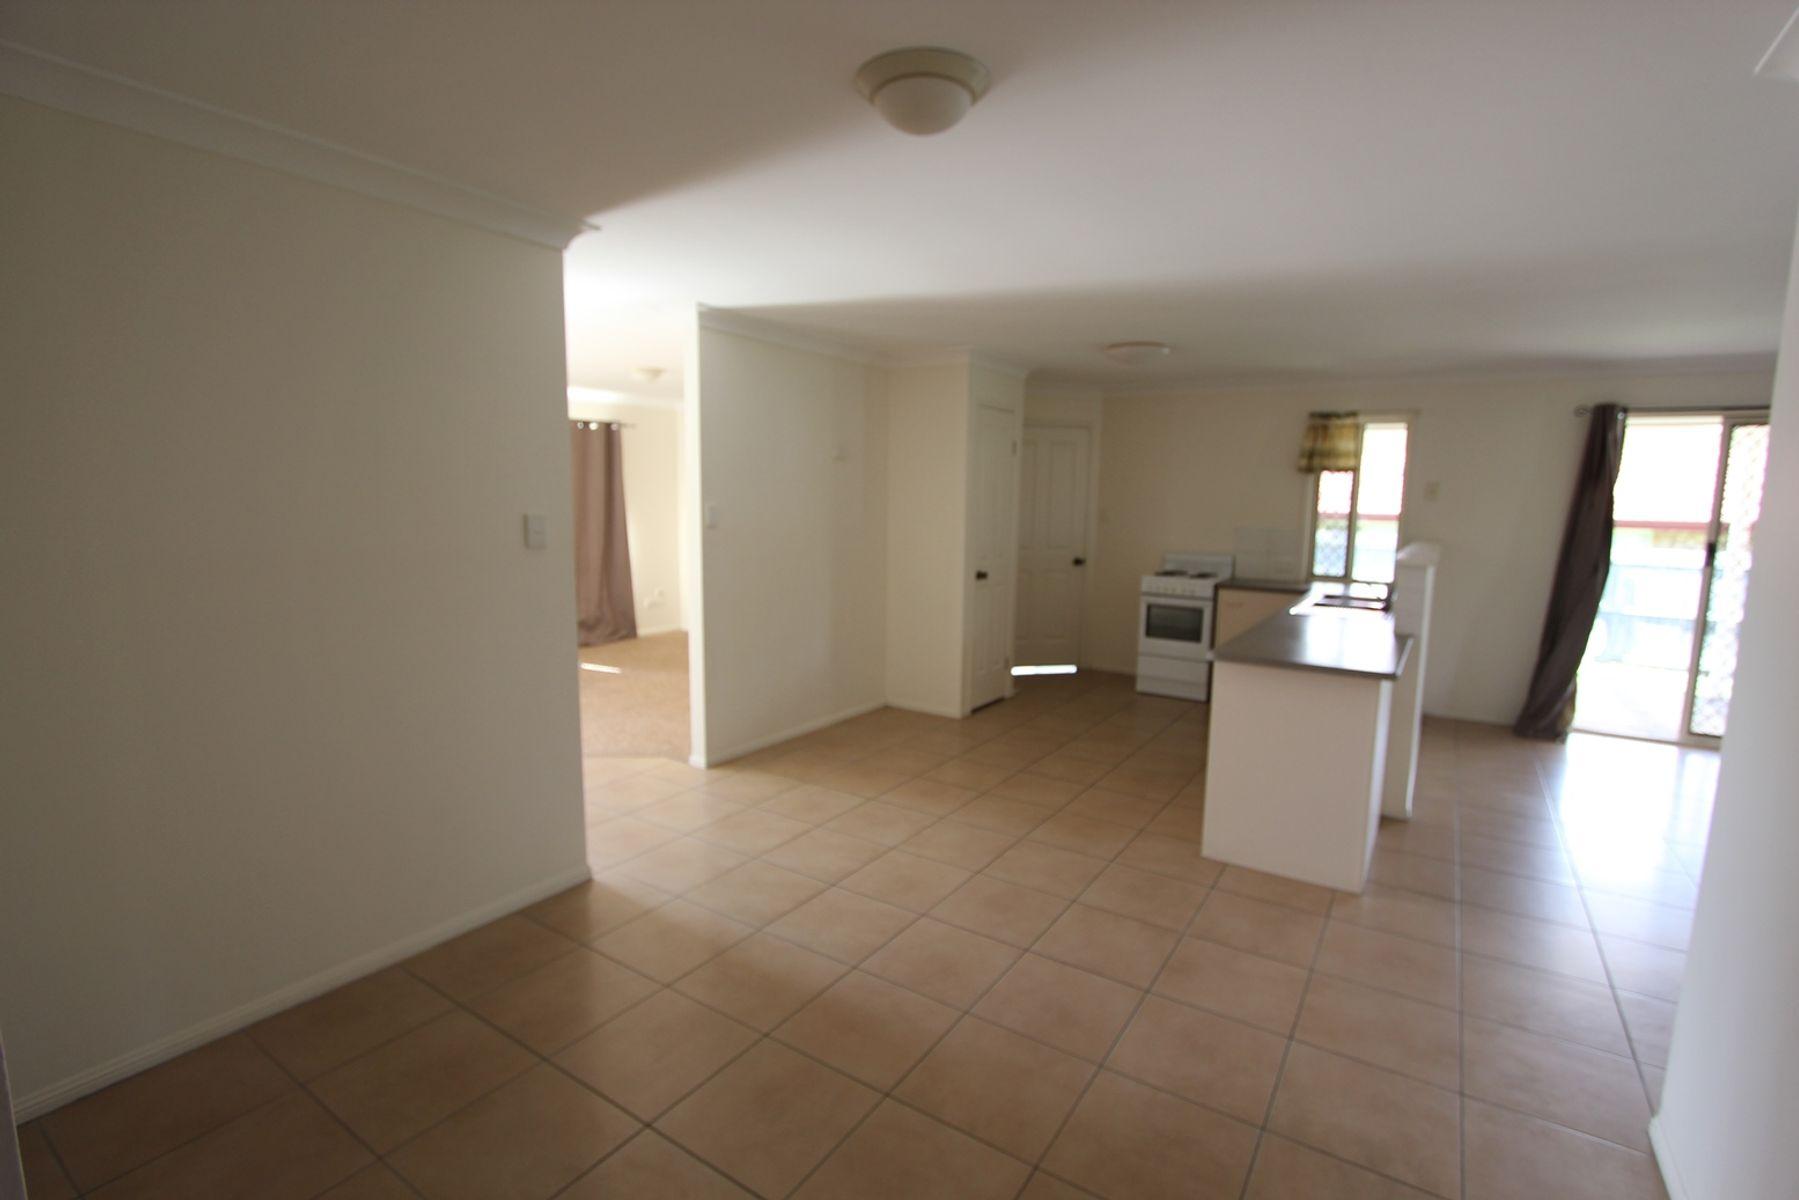 44 Cassowary Street, Doolandella, QLD 4077